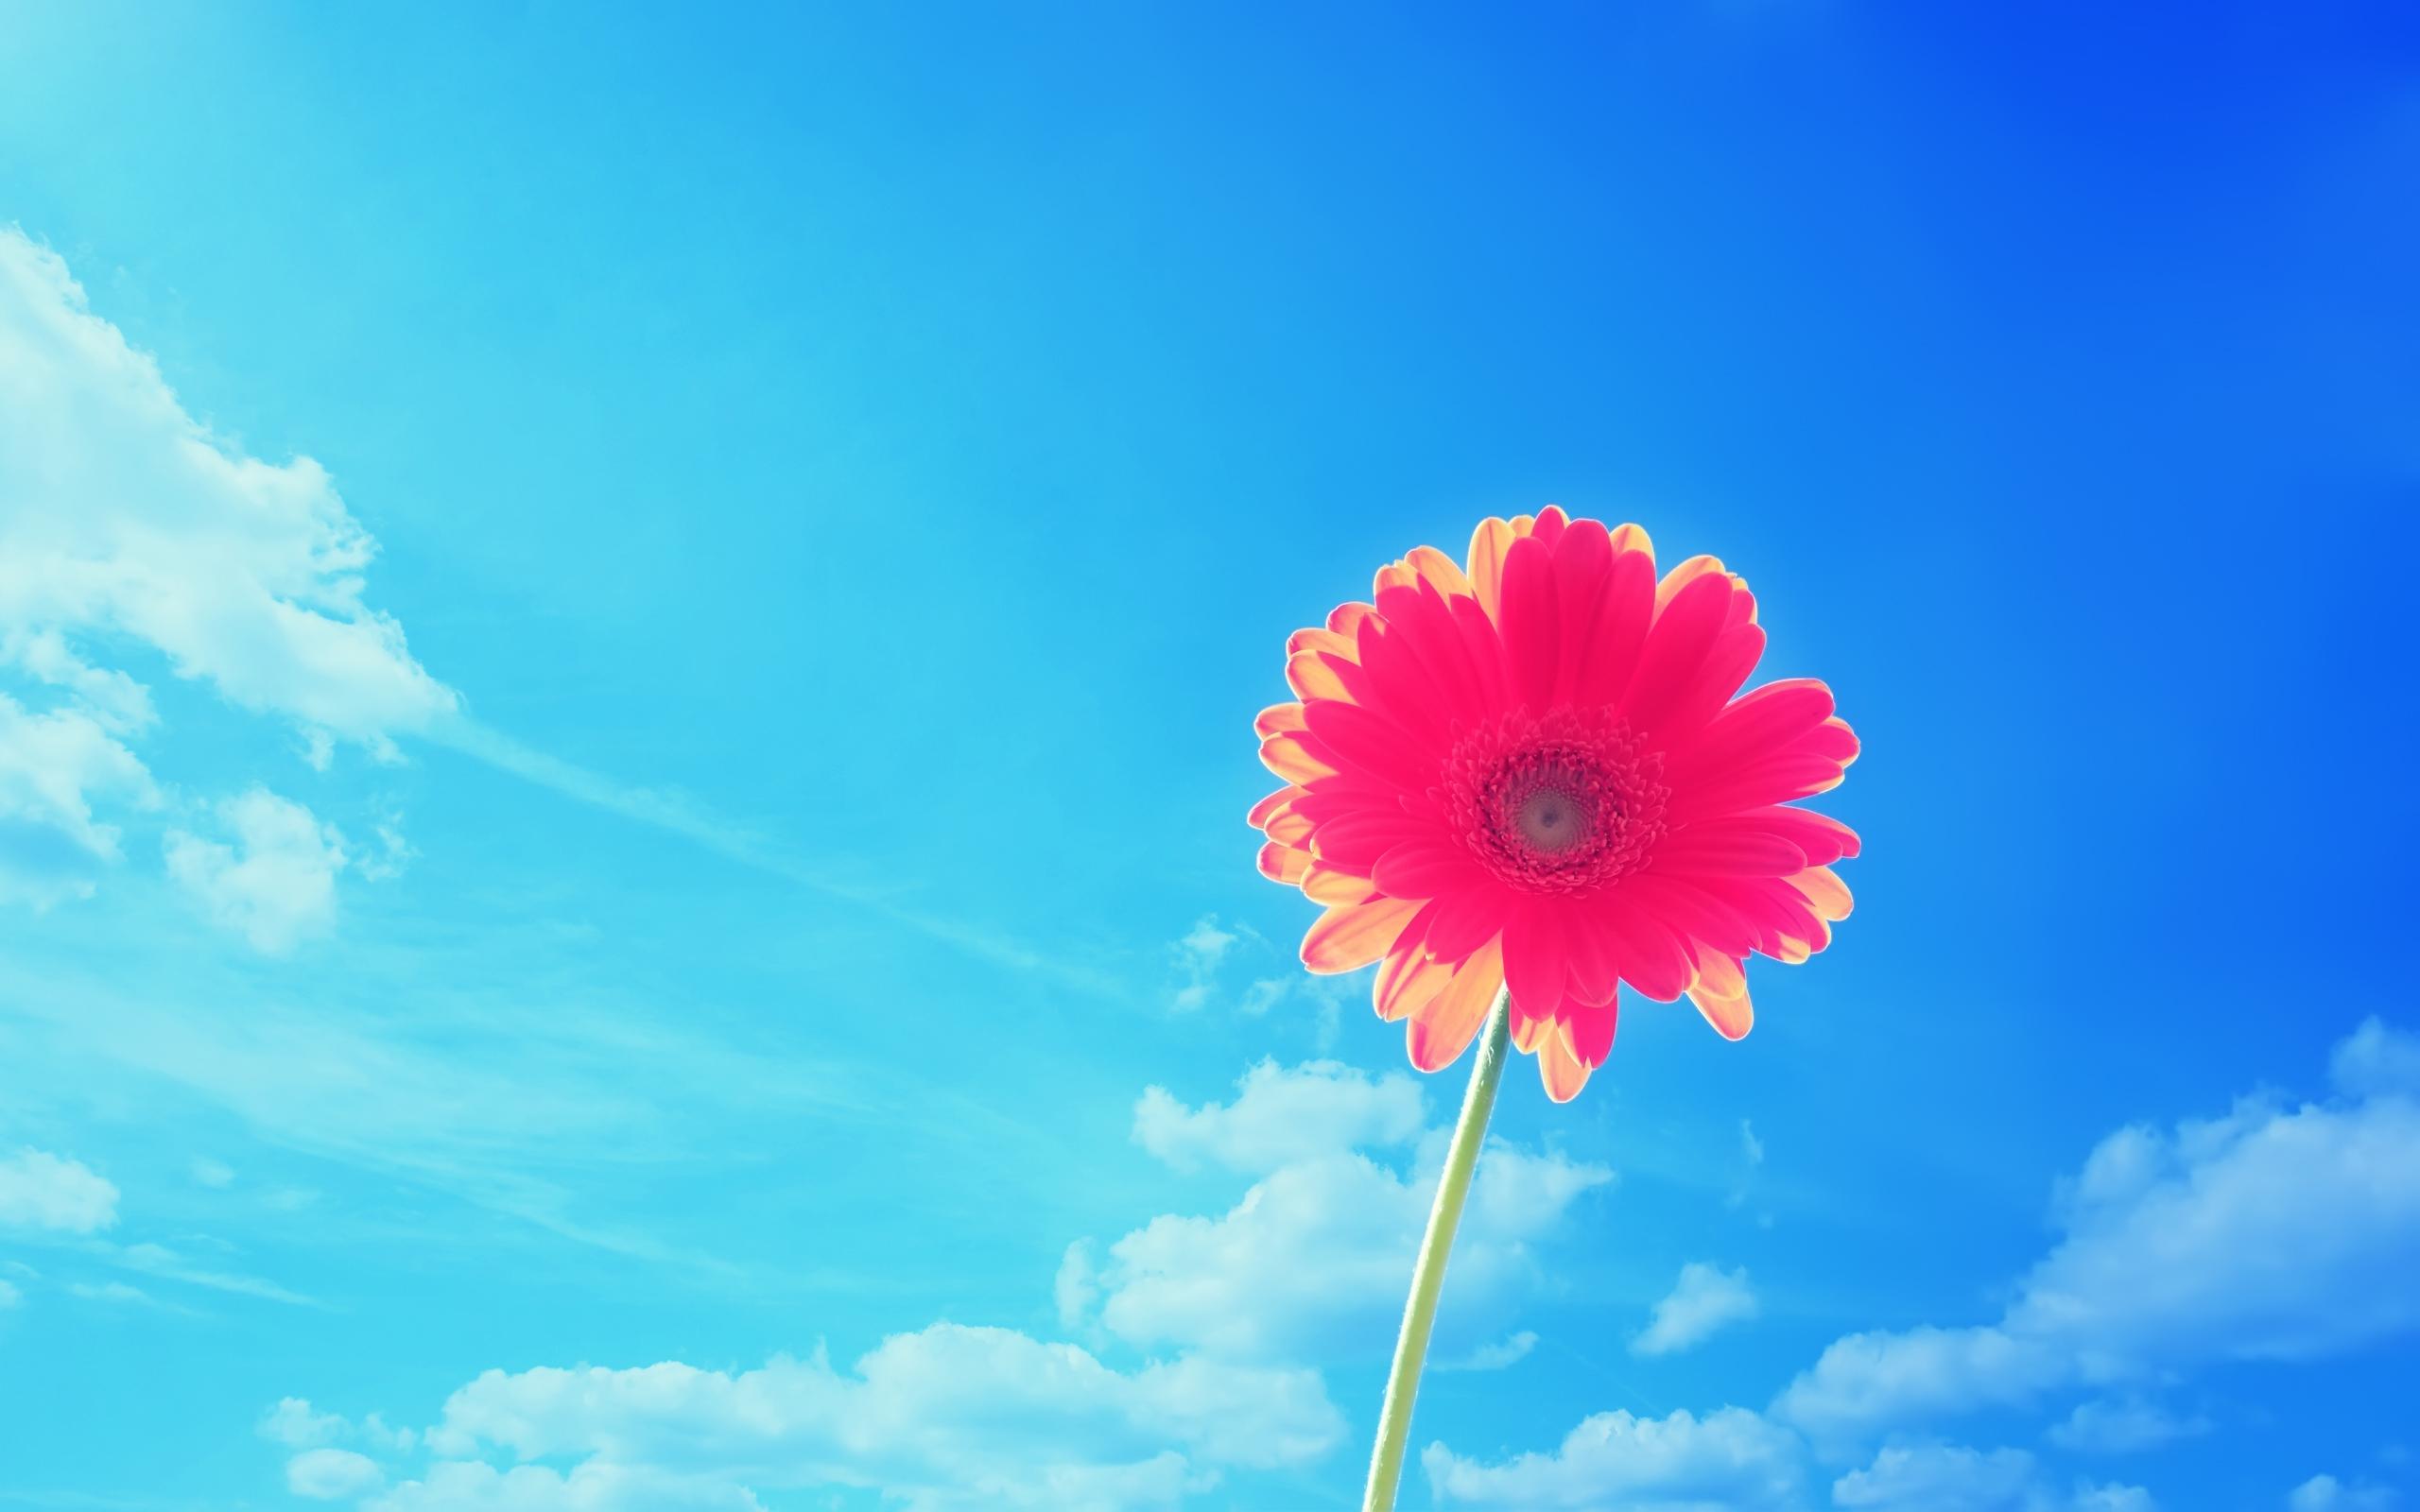 pink flowers desktop wallpaper hd wallpaper